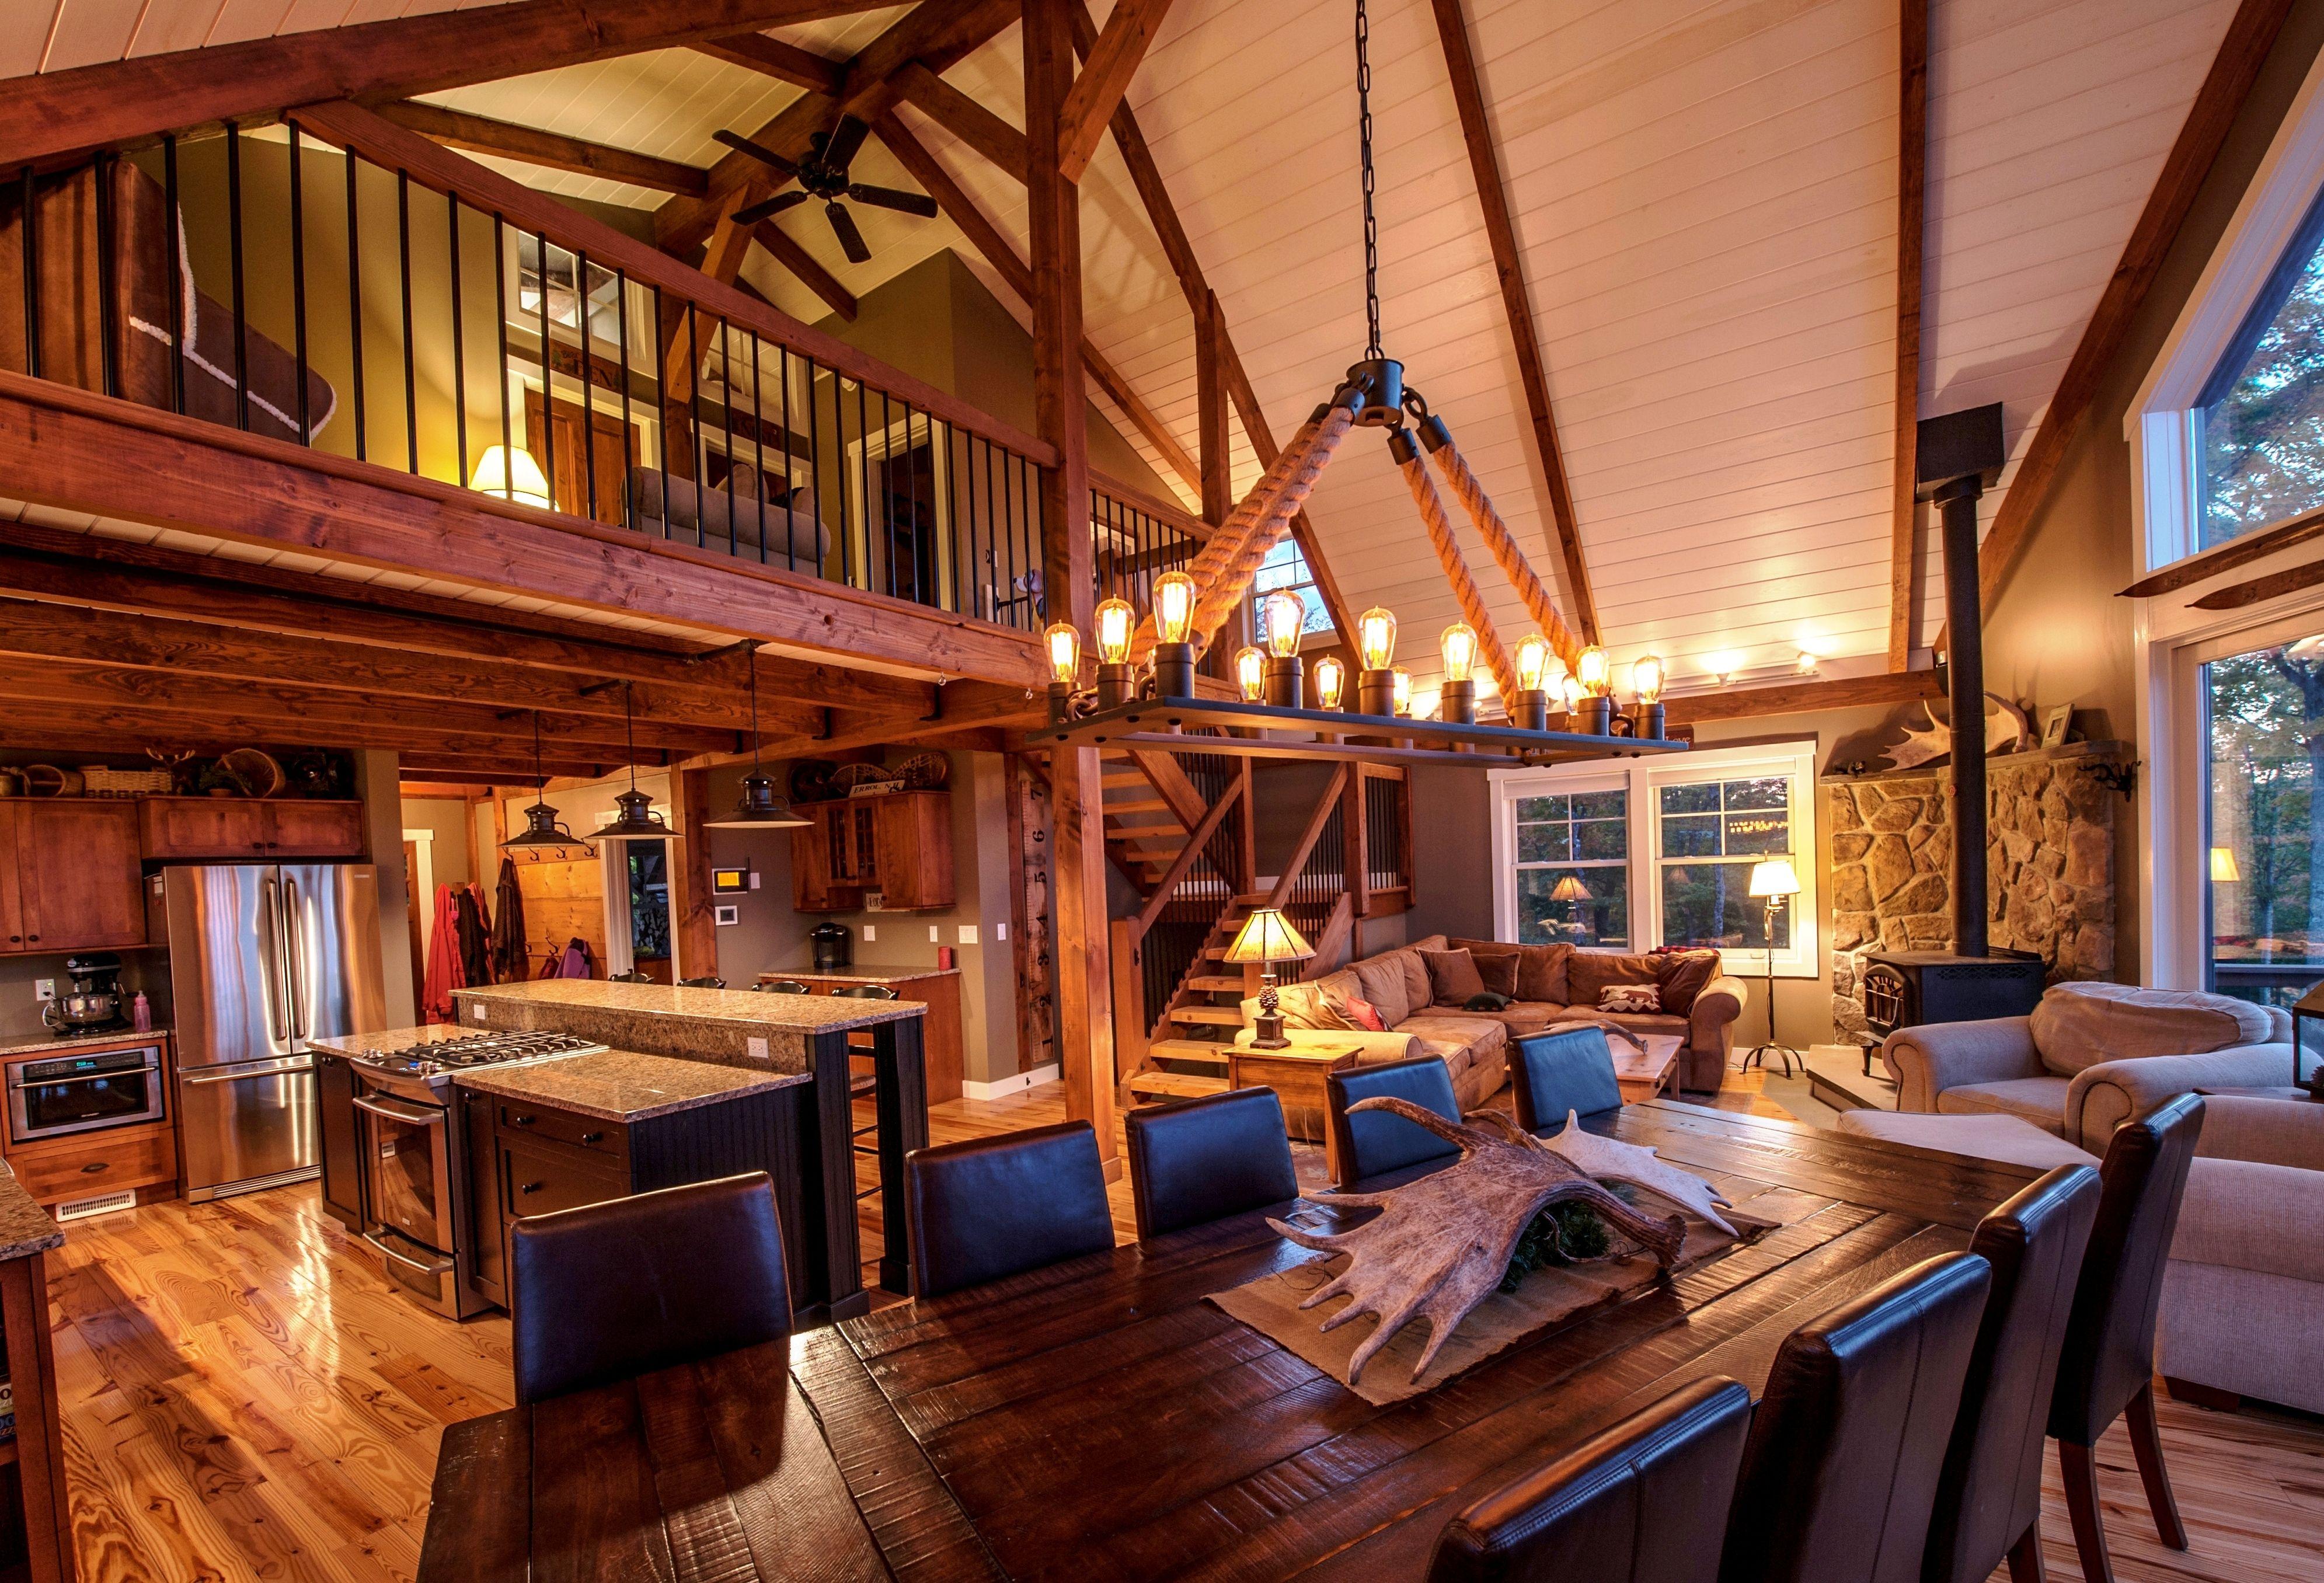 The Barn House Loft at Moose Ridge Lodge   Barn, Lofts and Ceilings